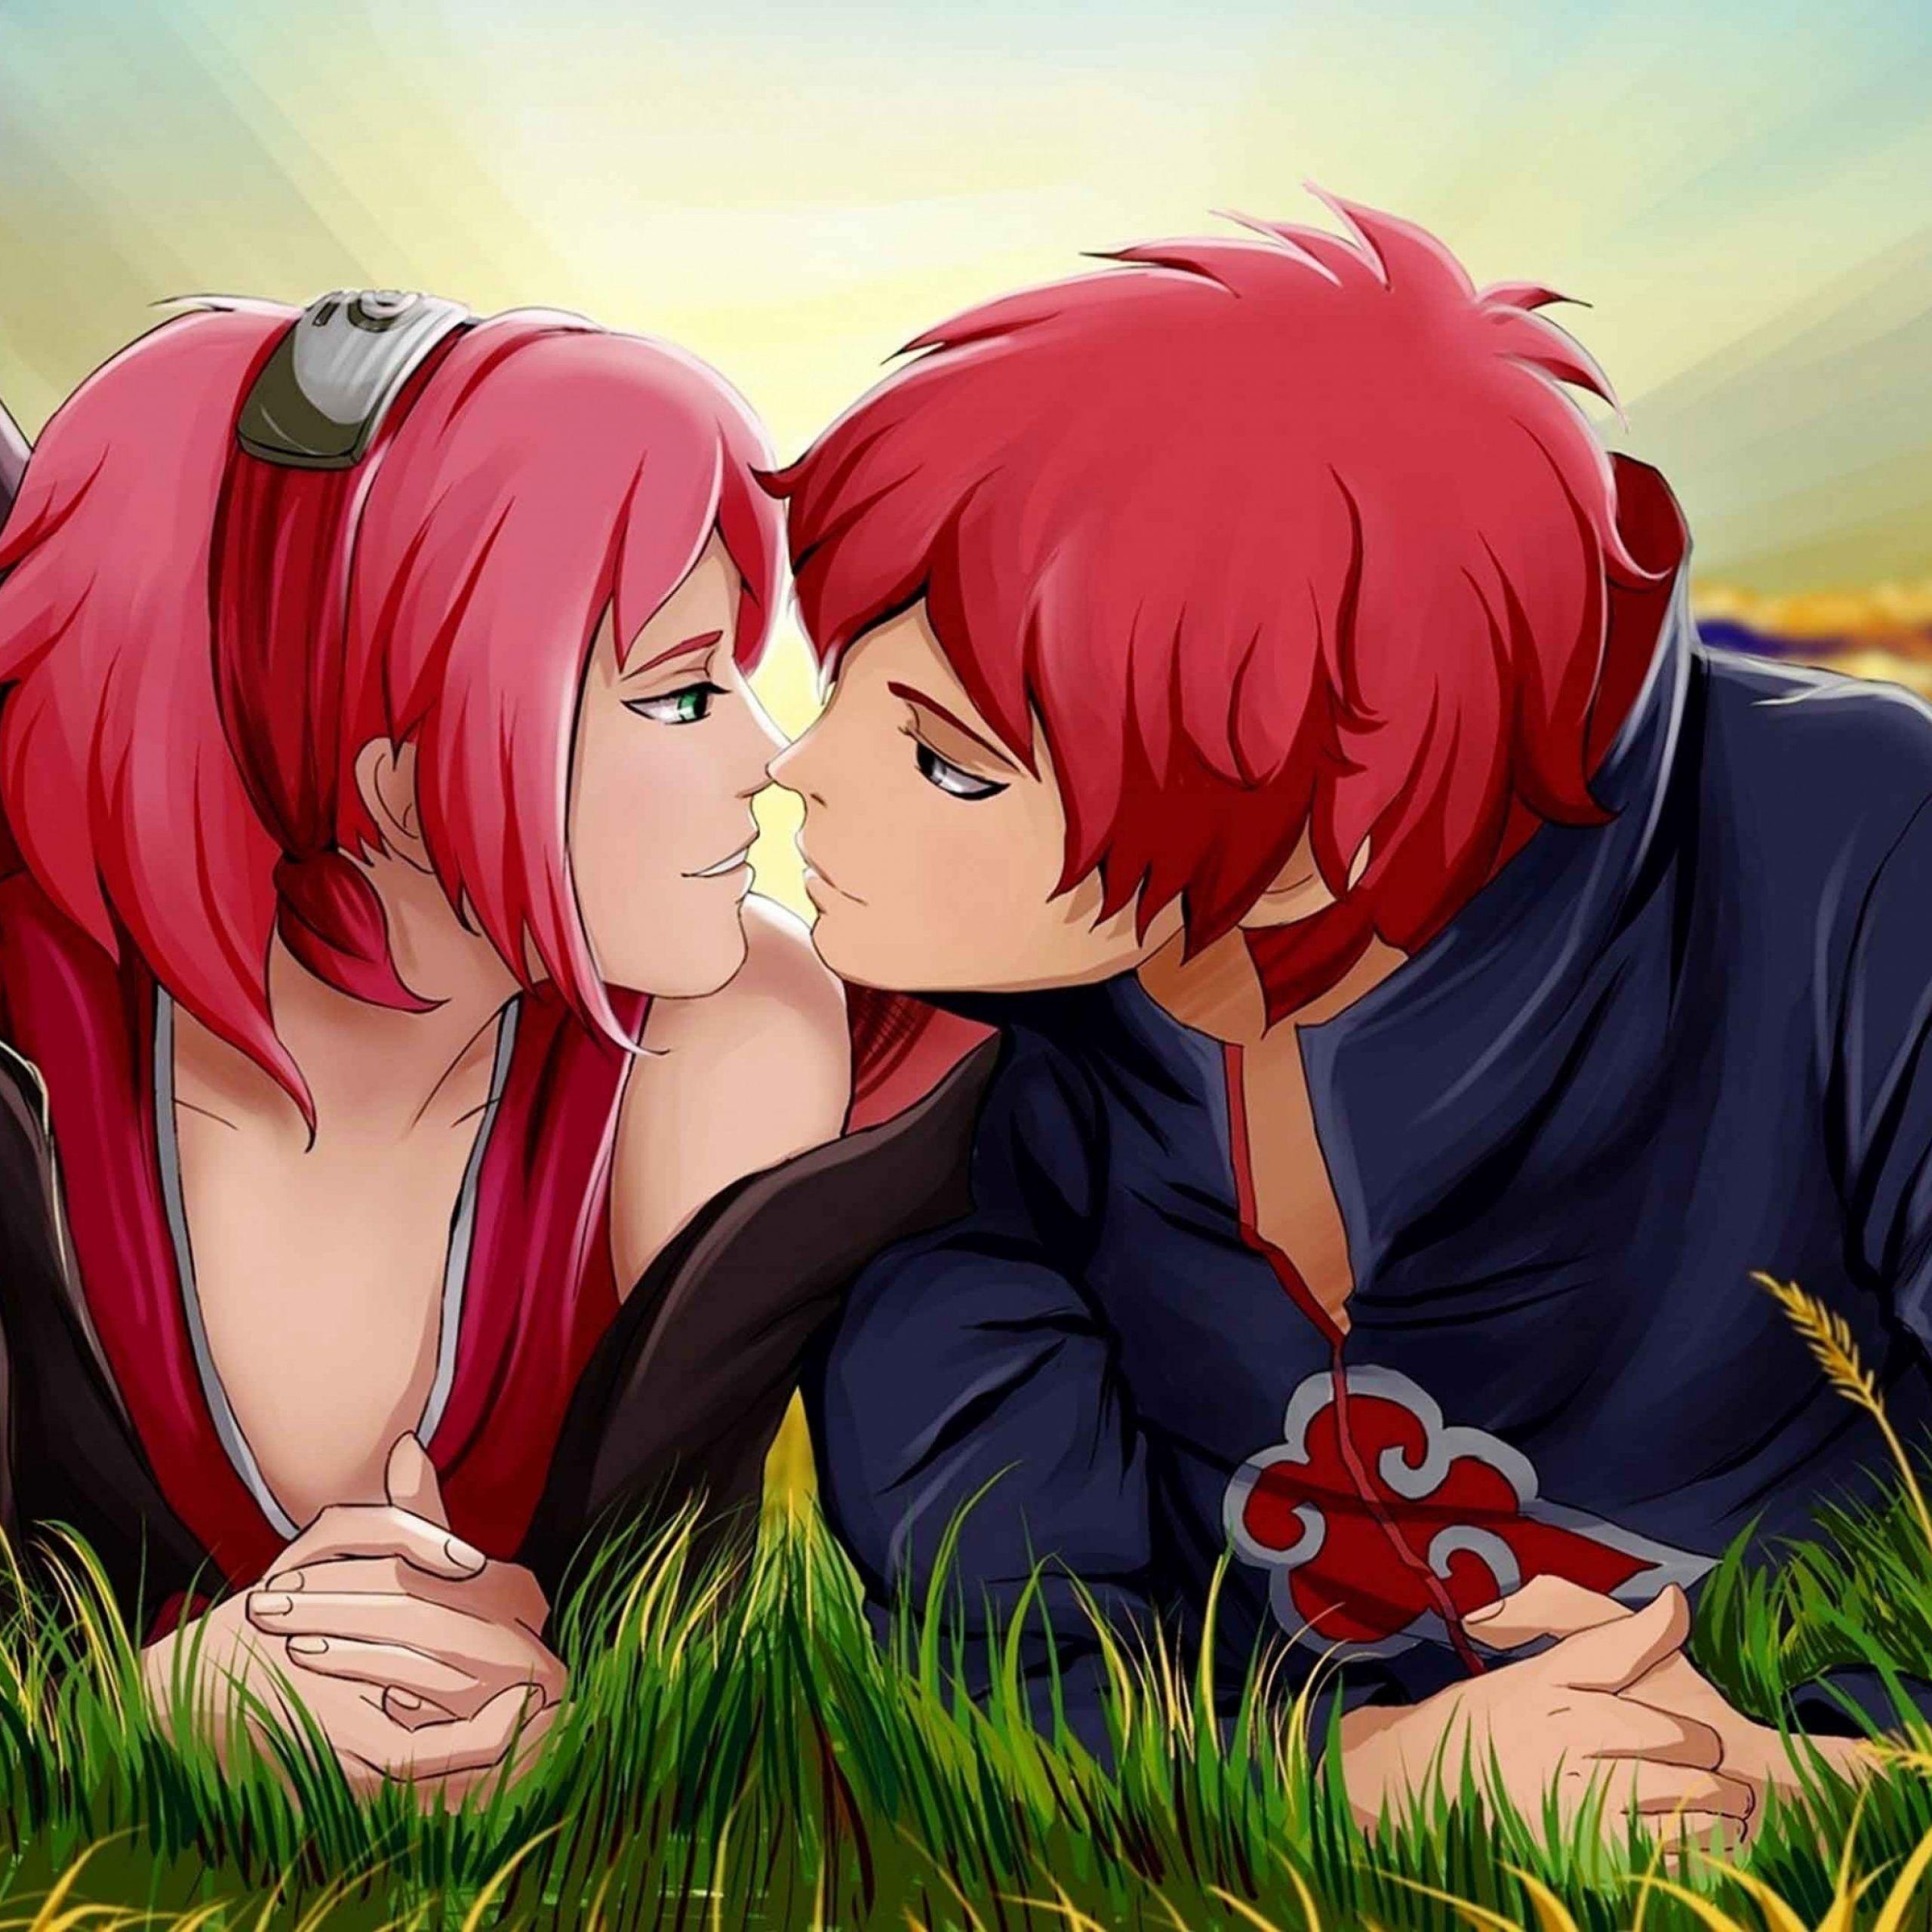 Anime Love Wallpaper Hd 3d gambar ke 17